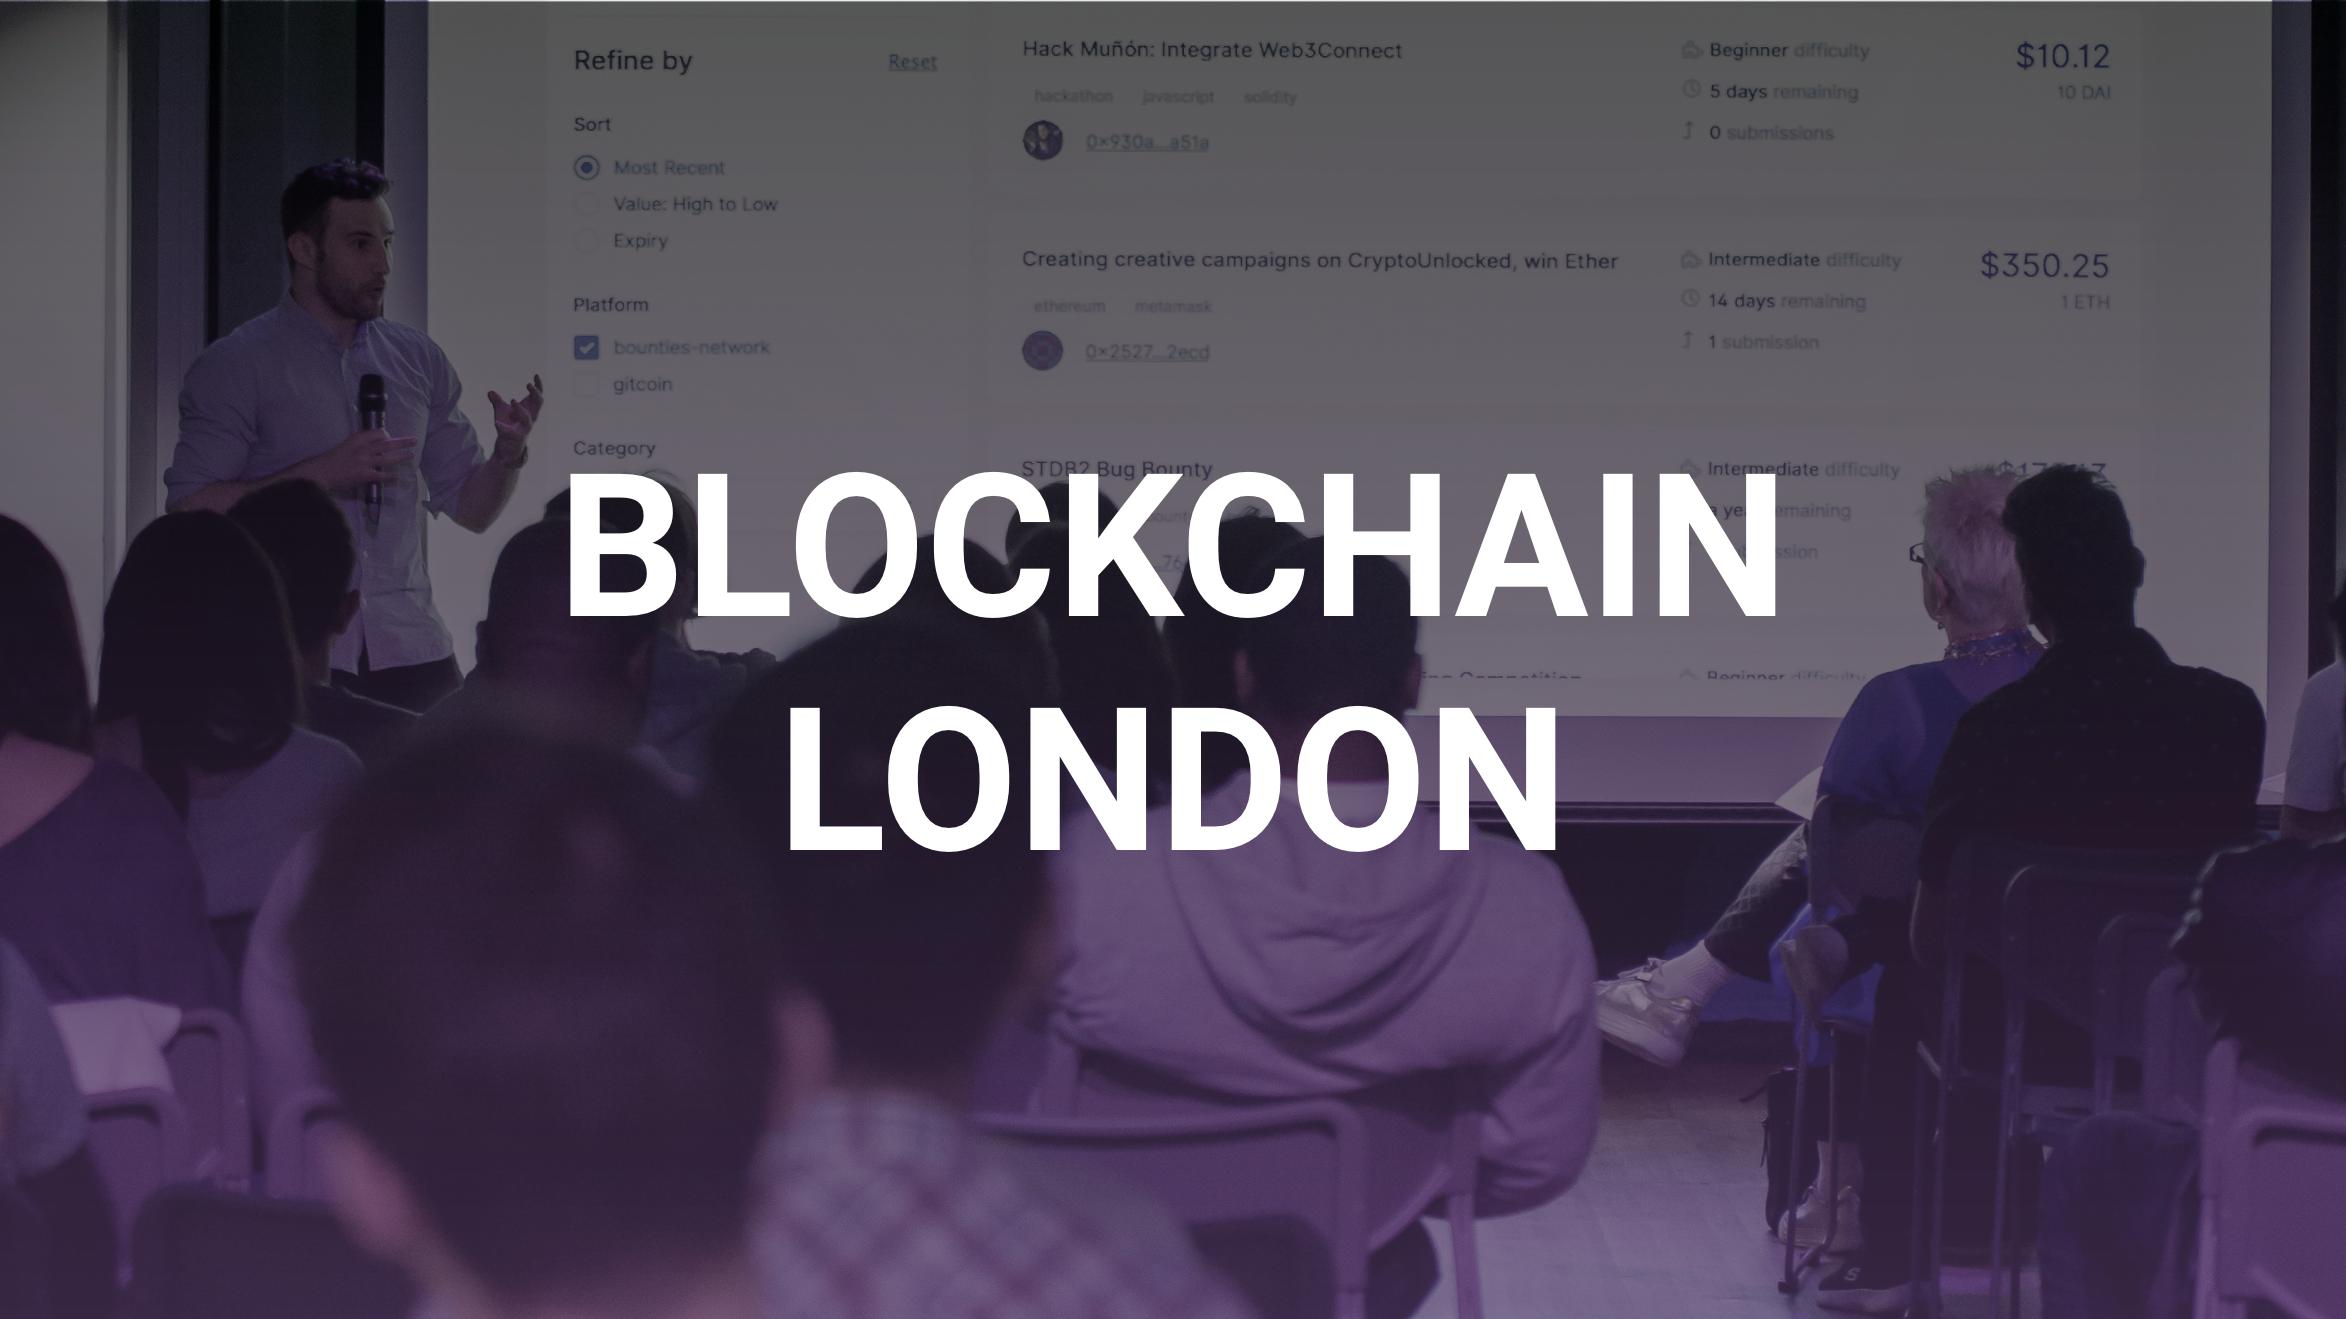 Blockchain London